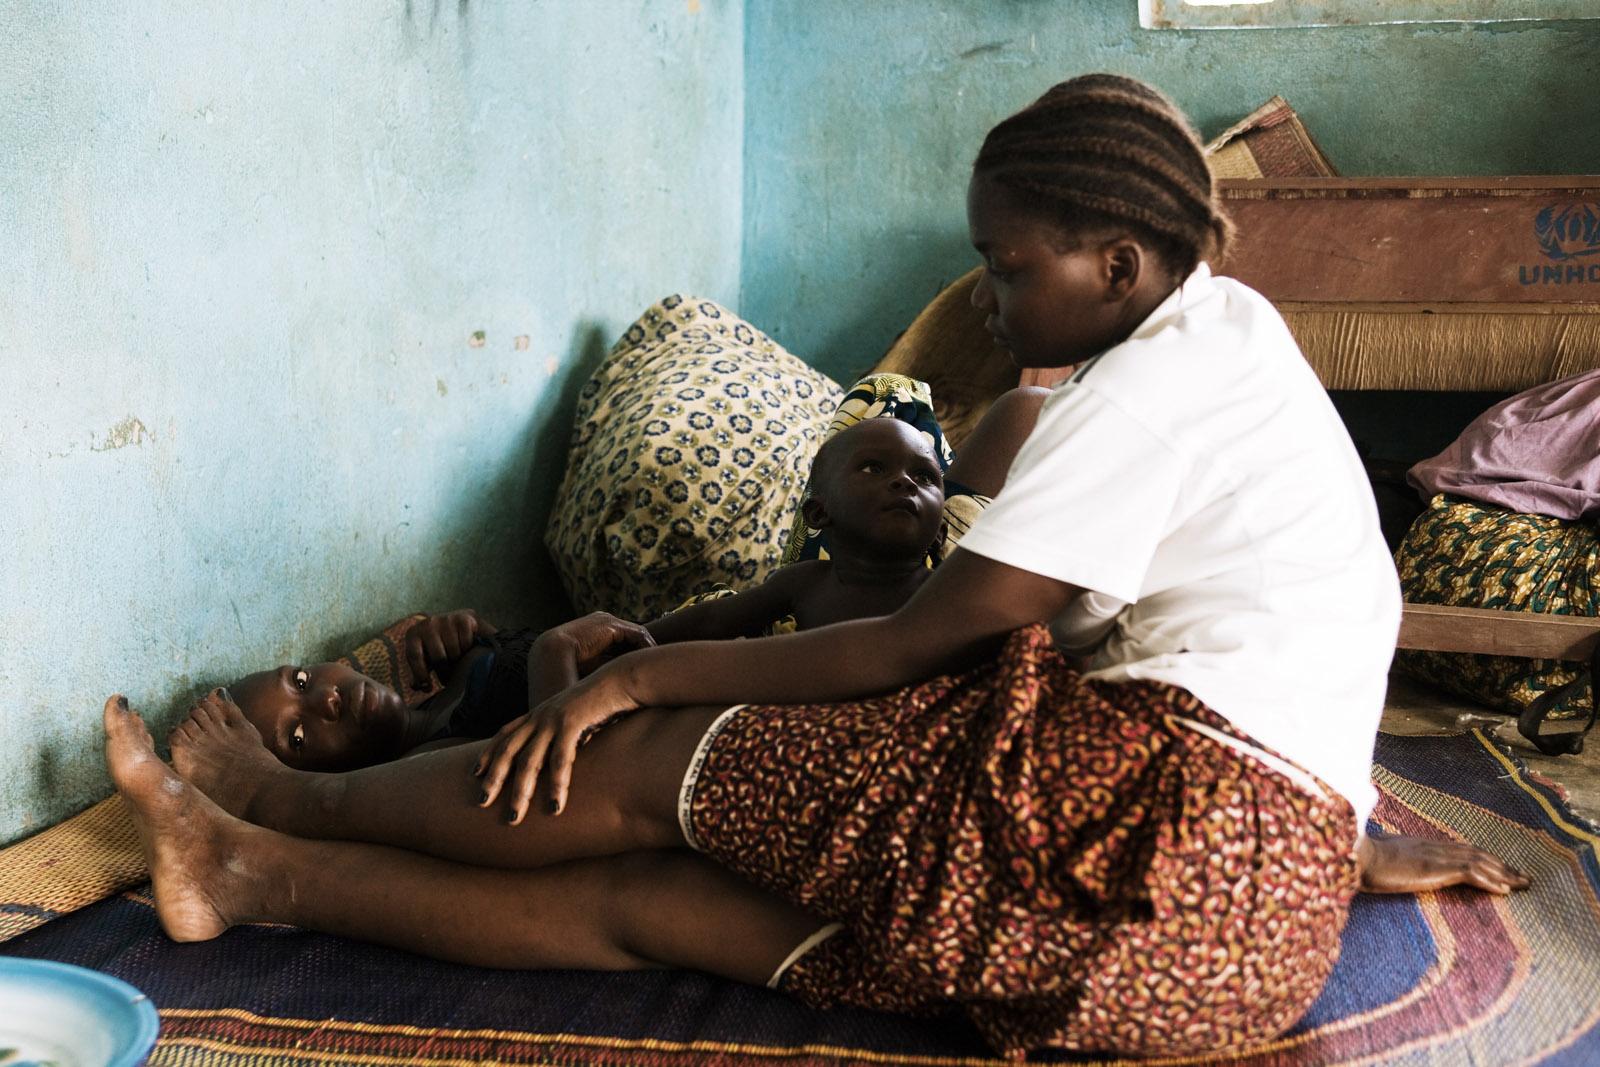 liberia-refugies-ivoiriens-0311-0135hd